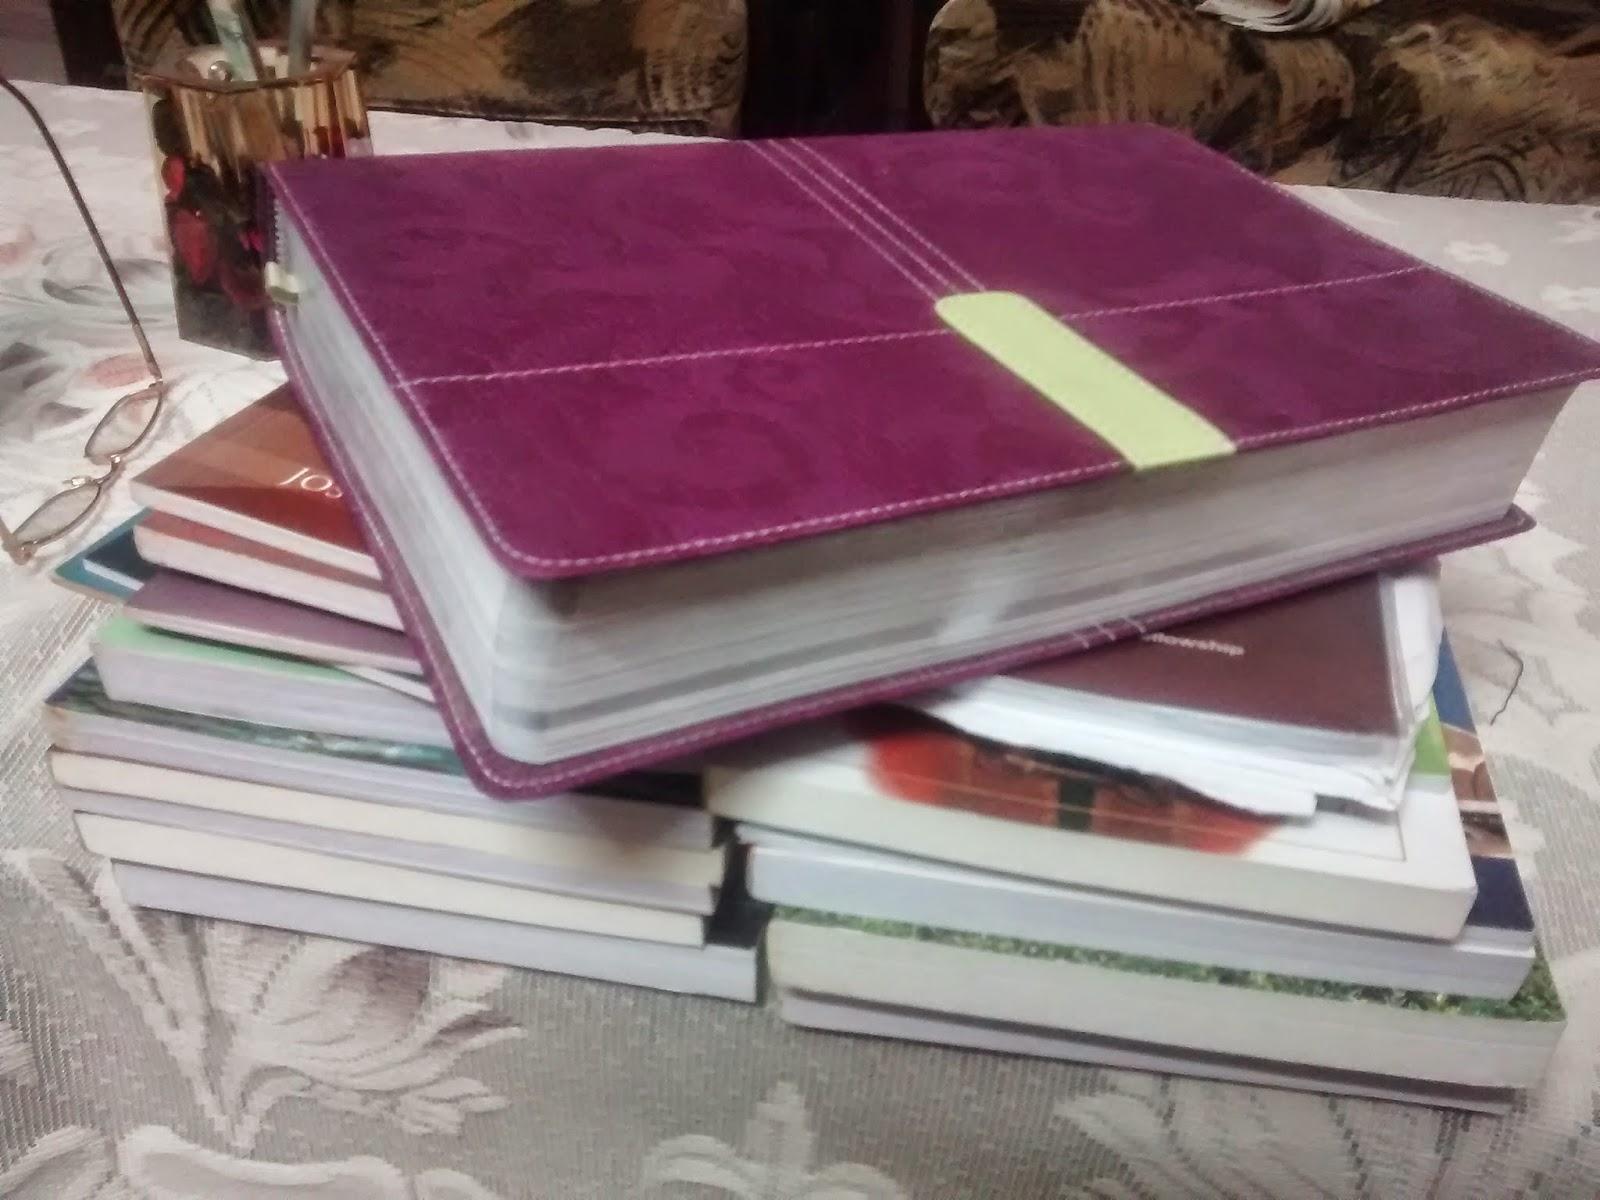 christian ebooks 1000 praise